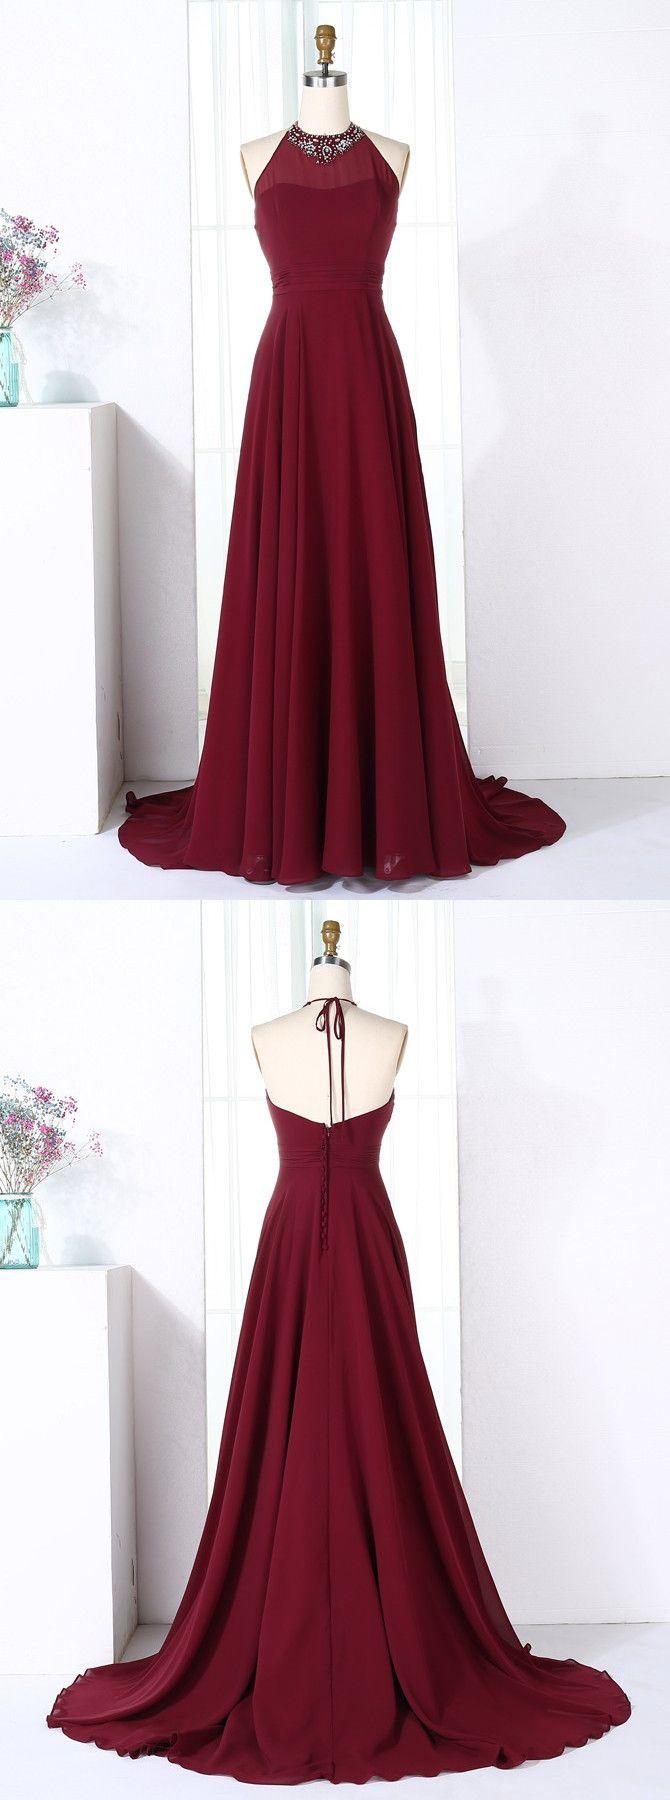 Aline halter sweep train burgundy chiffon bridesmaid dress with